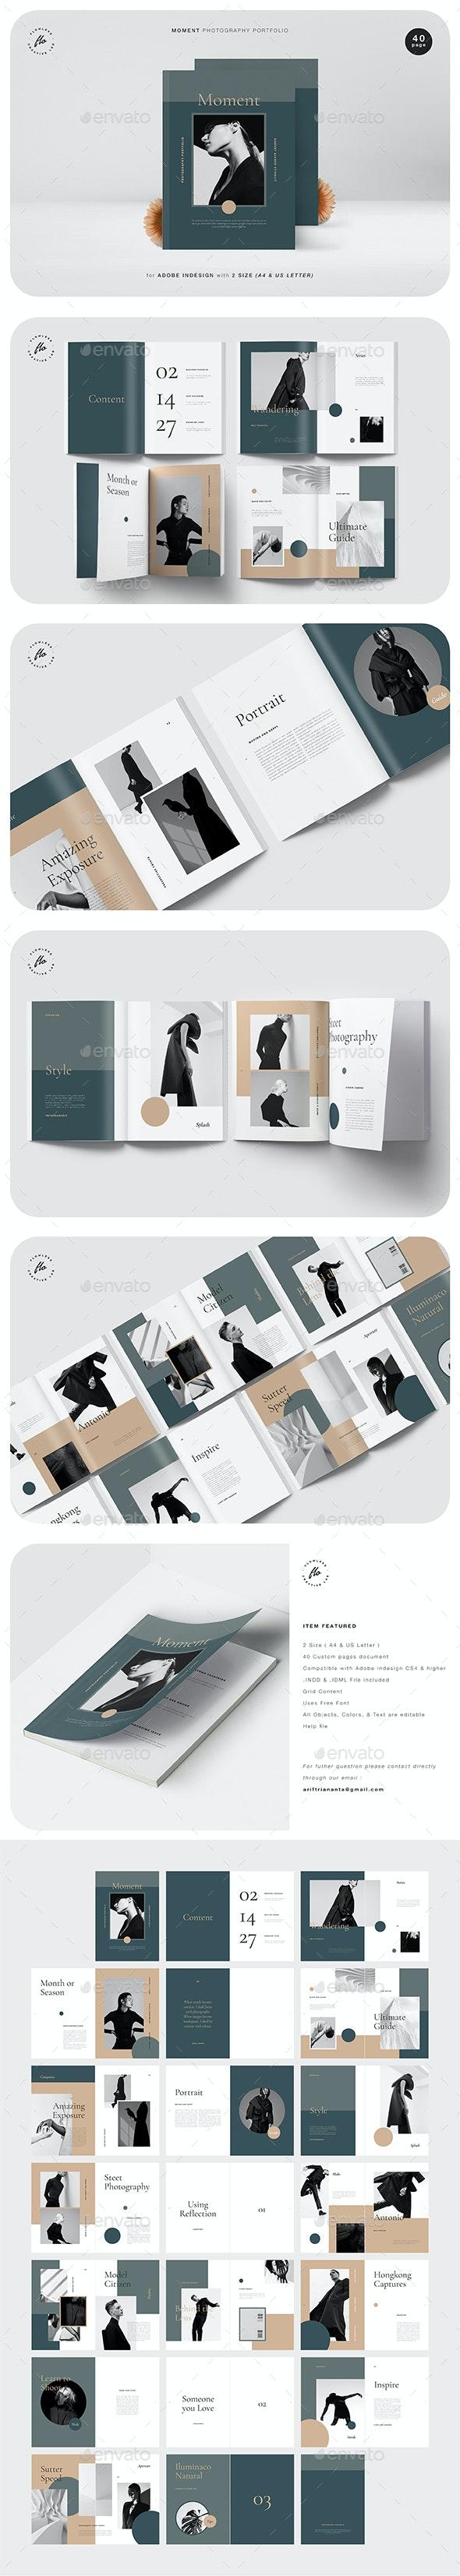 Moment Photography Portfolio - Magazines Print Templates